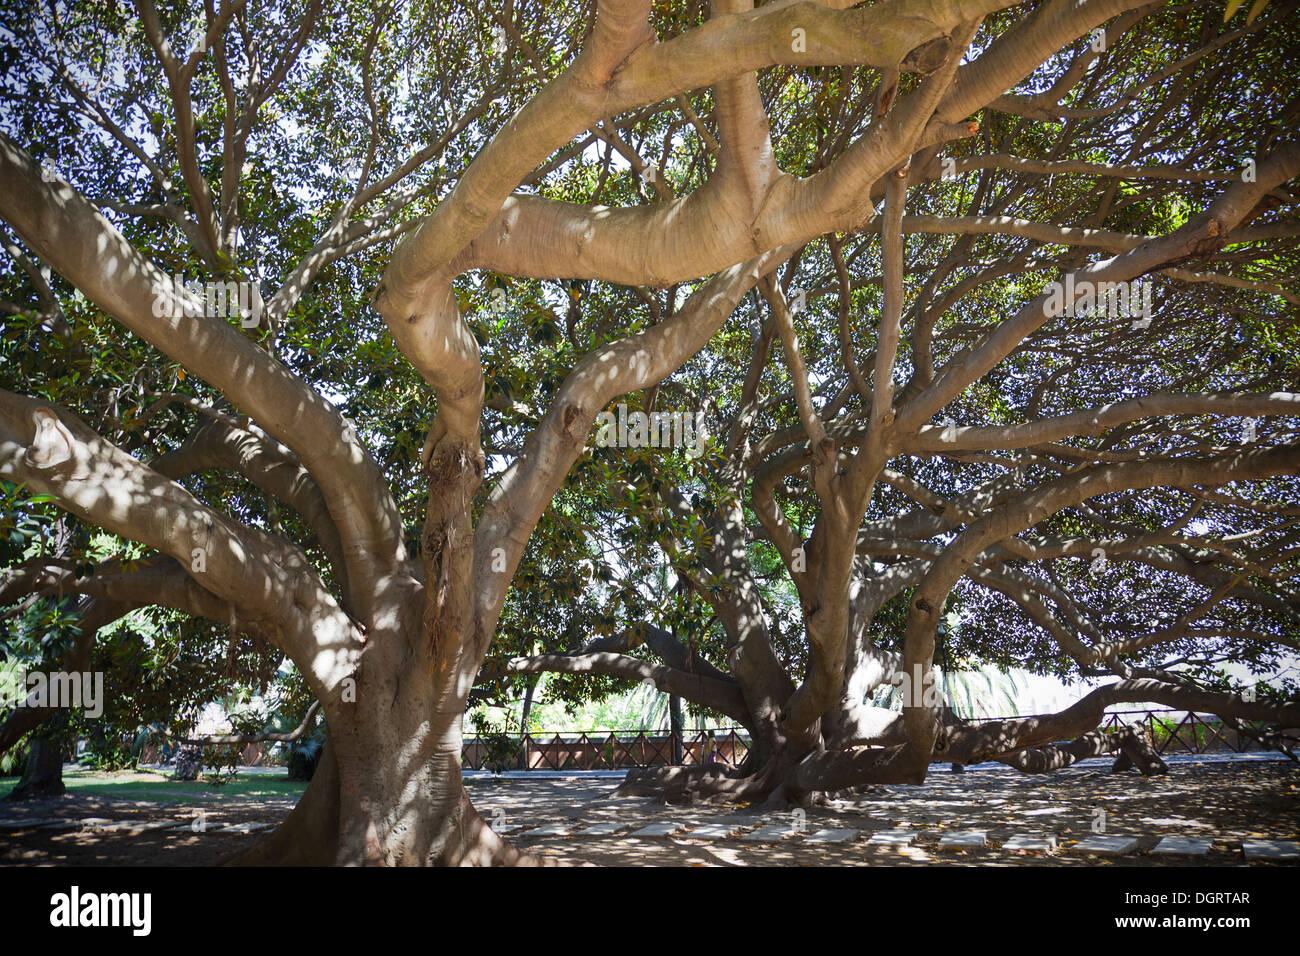 ficus trees stockfotos ficus trees bilder alamy. Black Bedroom Furniture Sets. Home Design Ideas